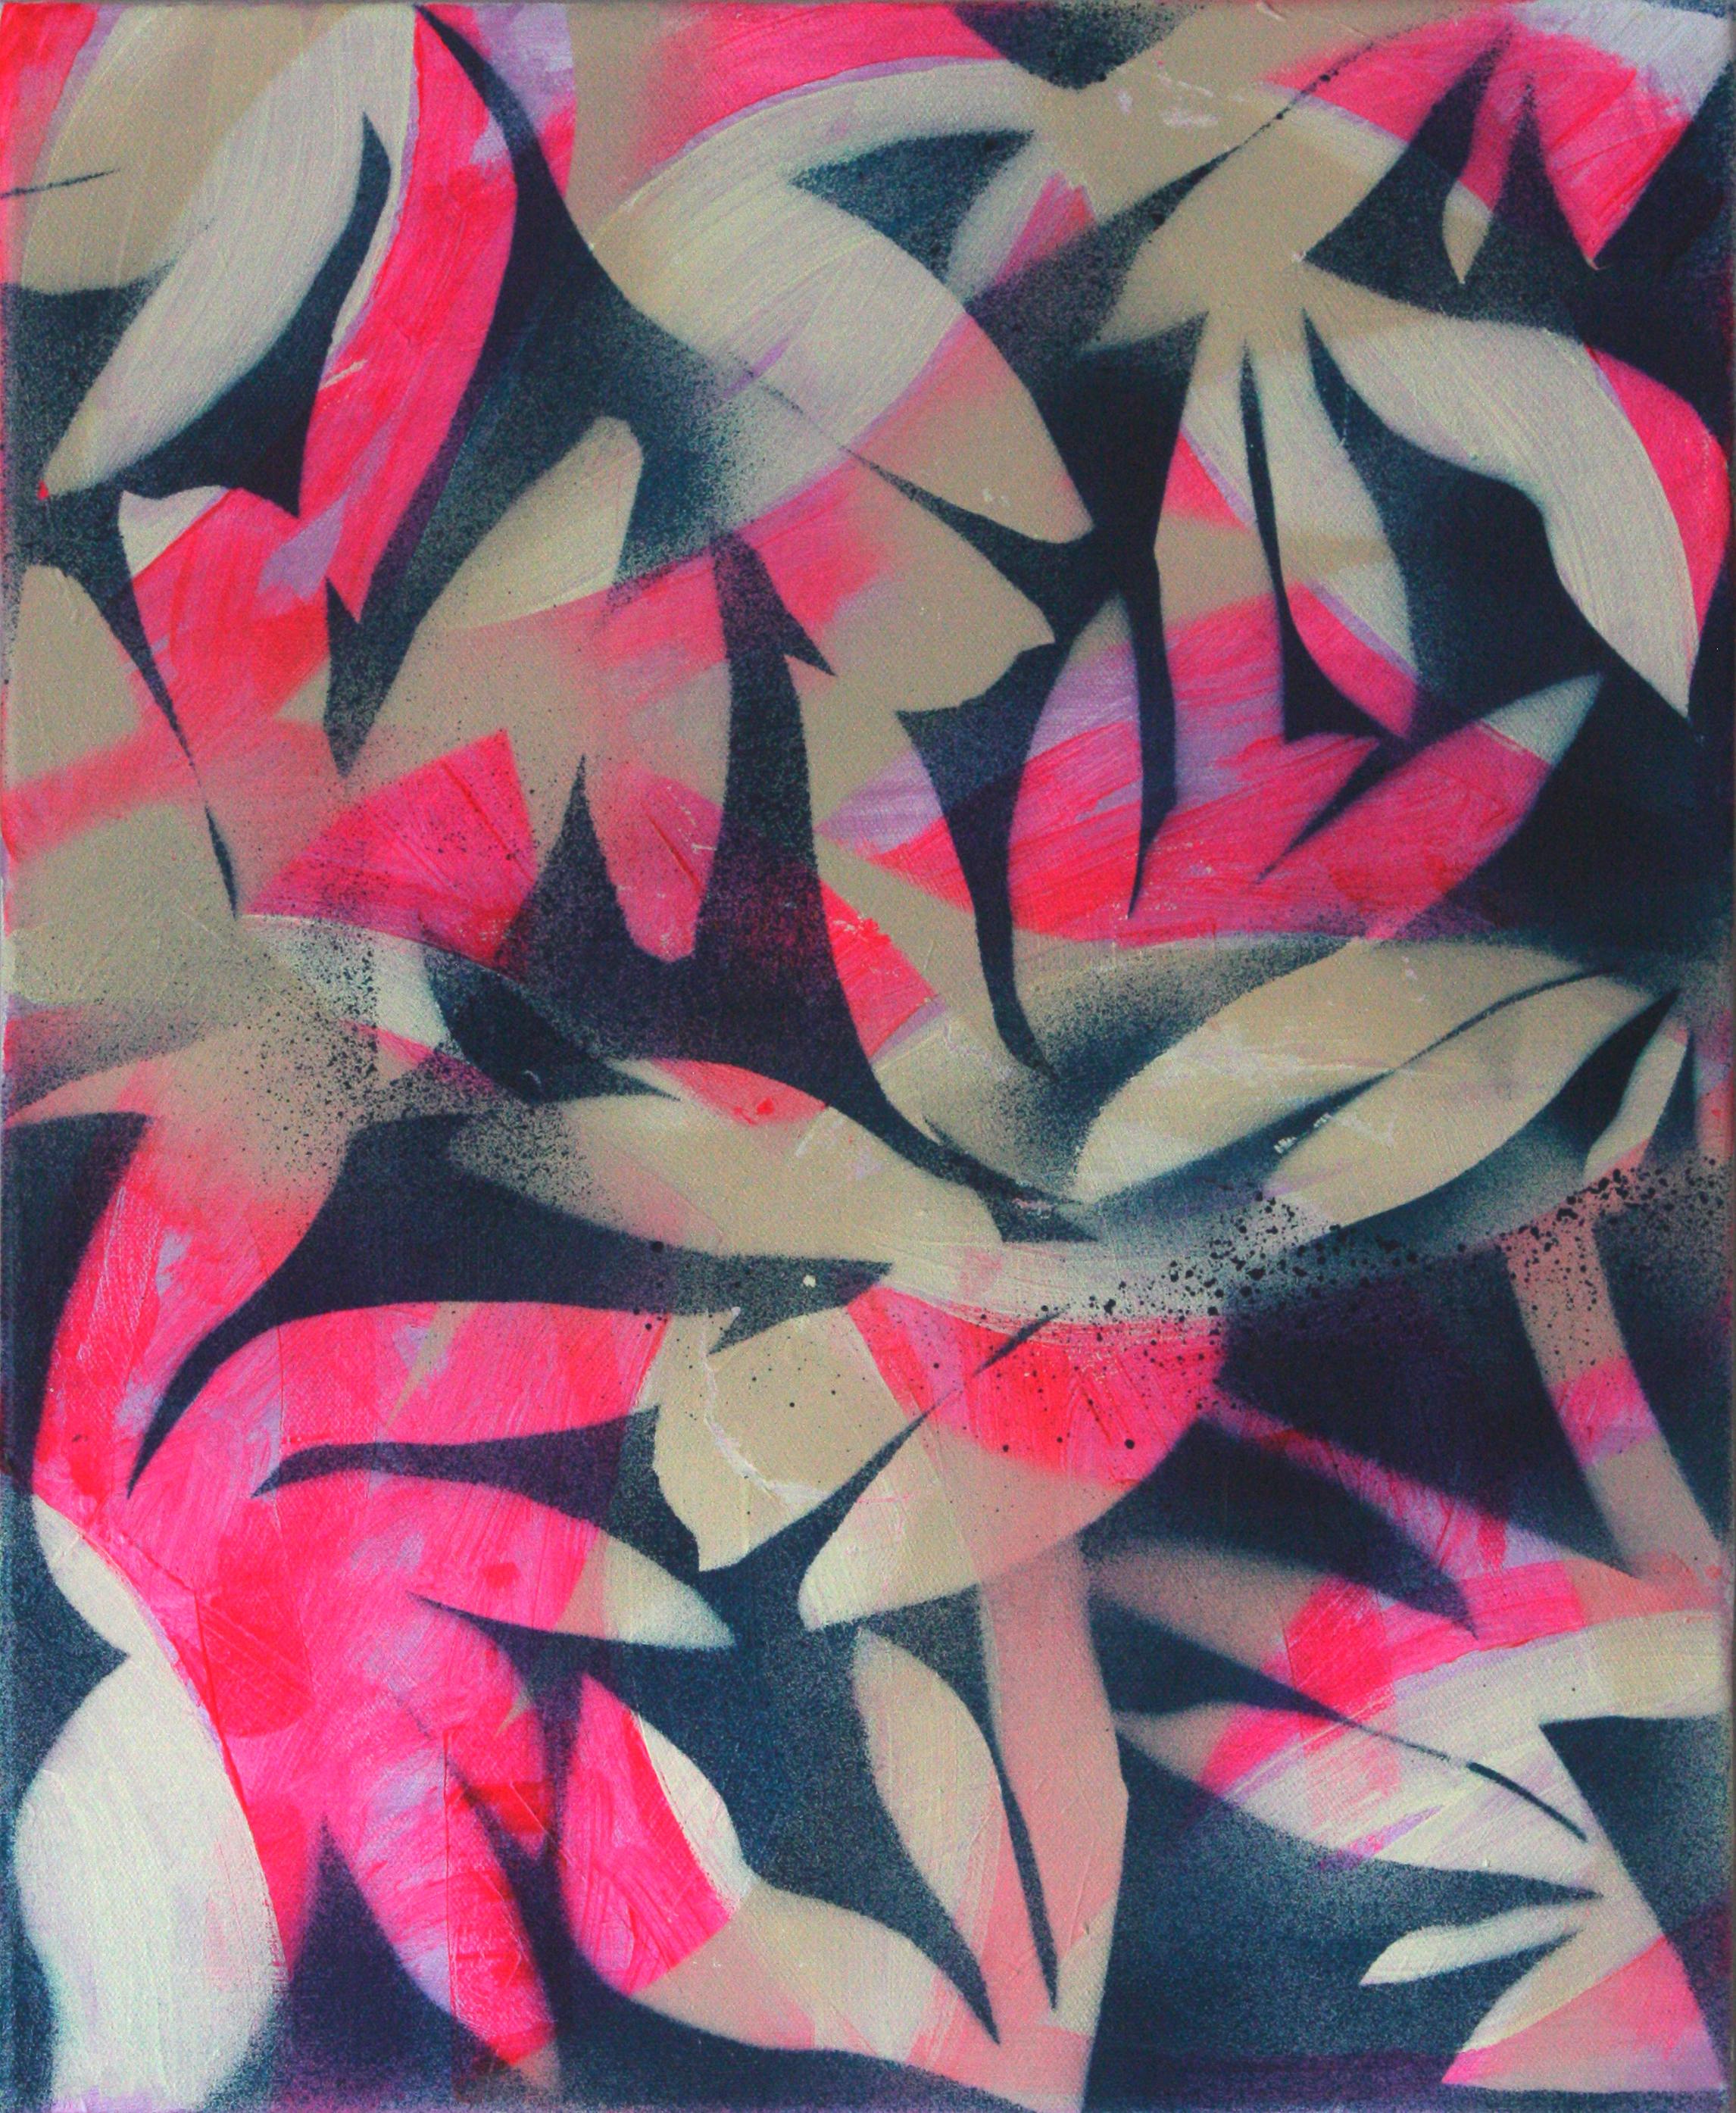 Feeling pink, 40 x 51cm, acrylic oil and spray paint on canvas, 2019